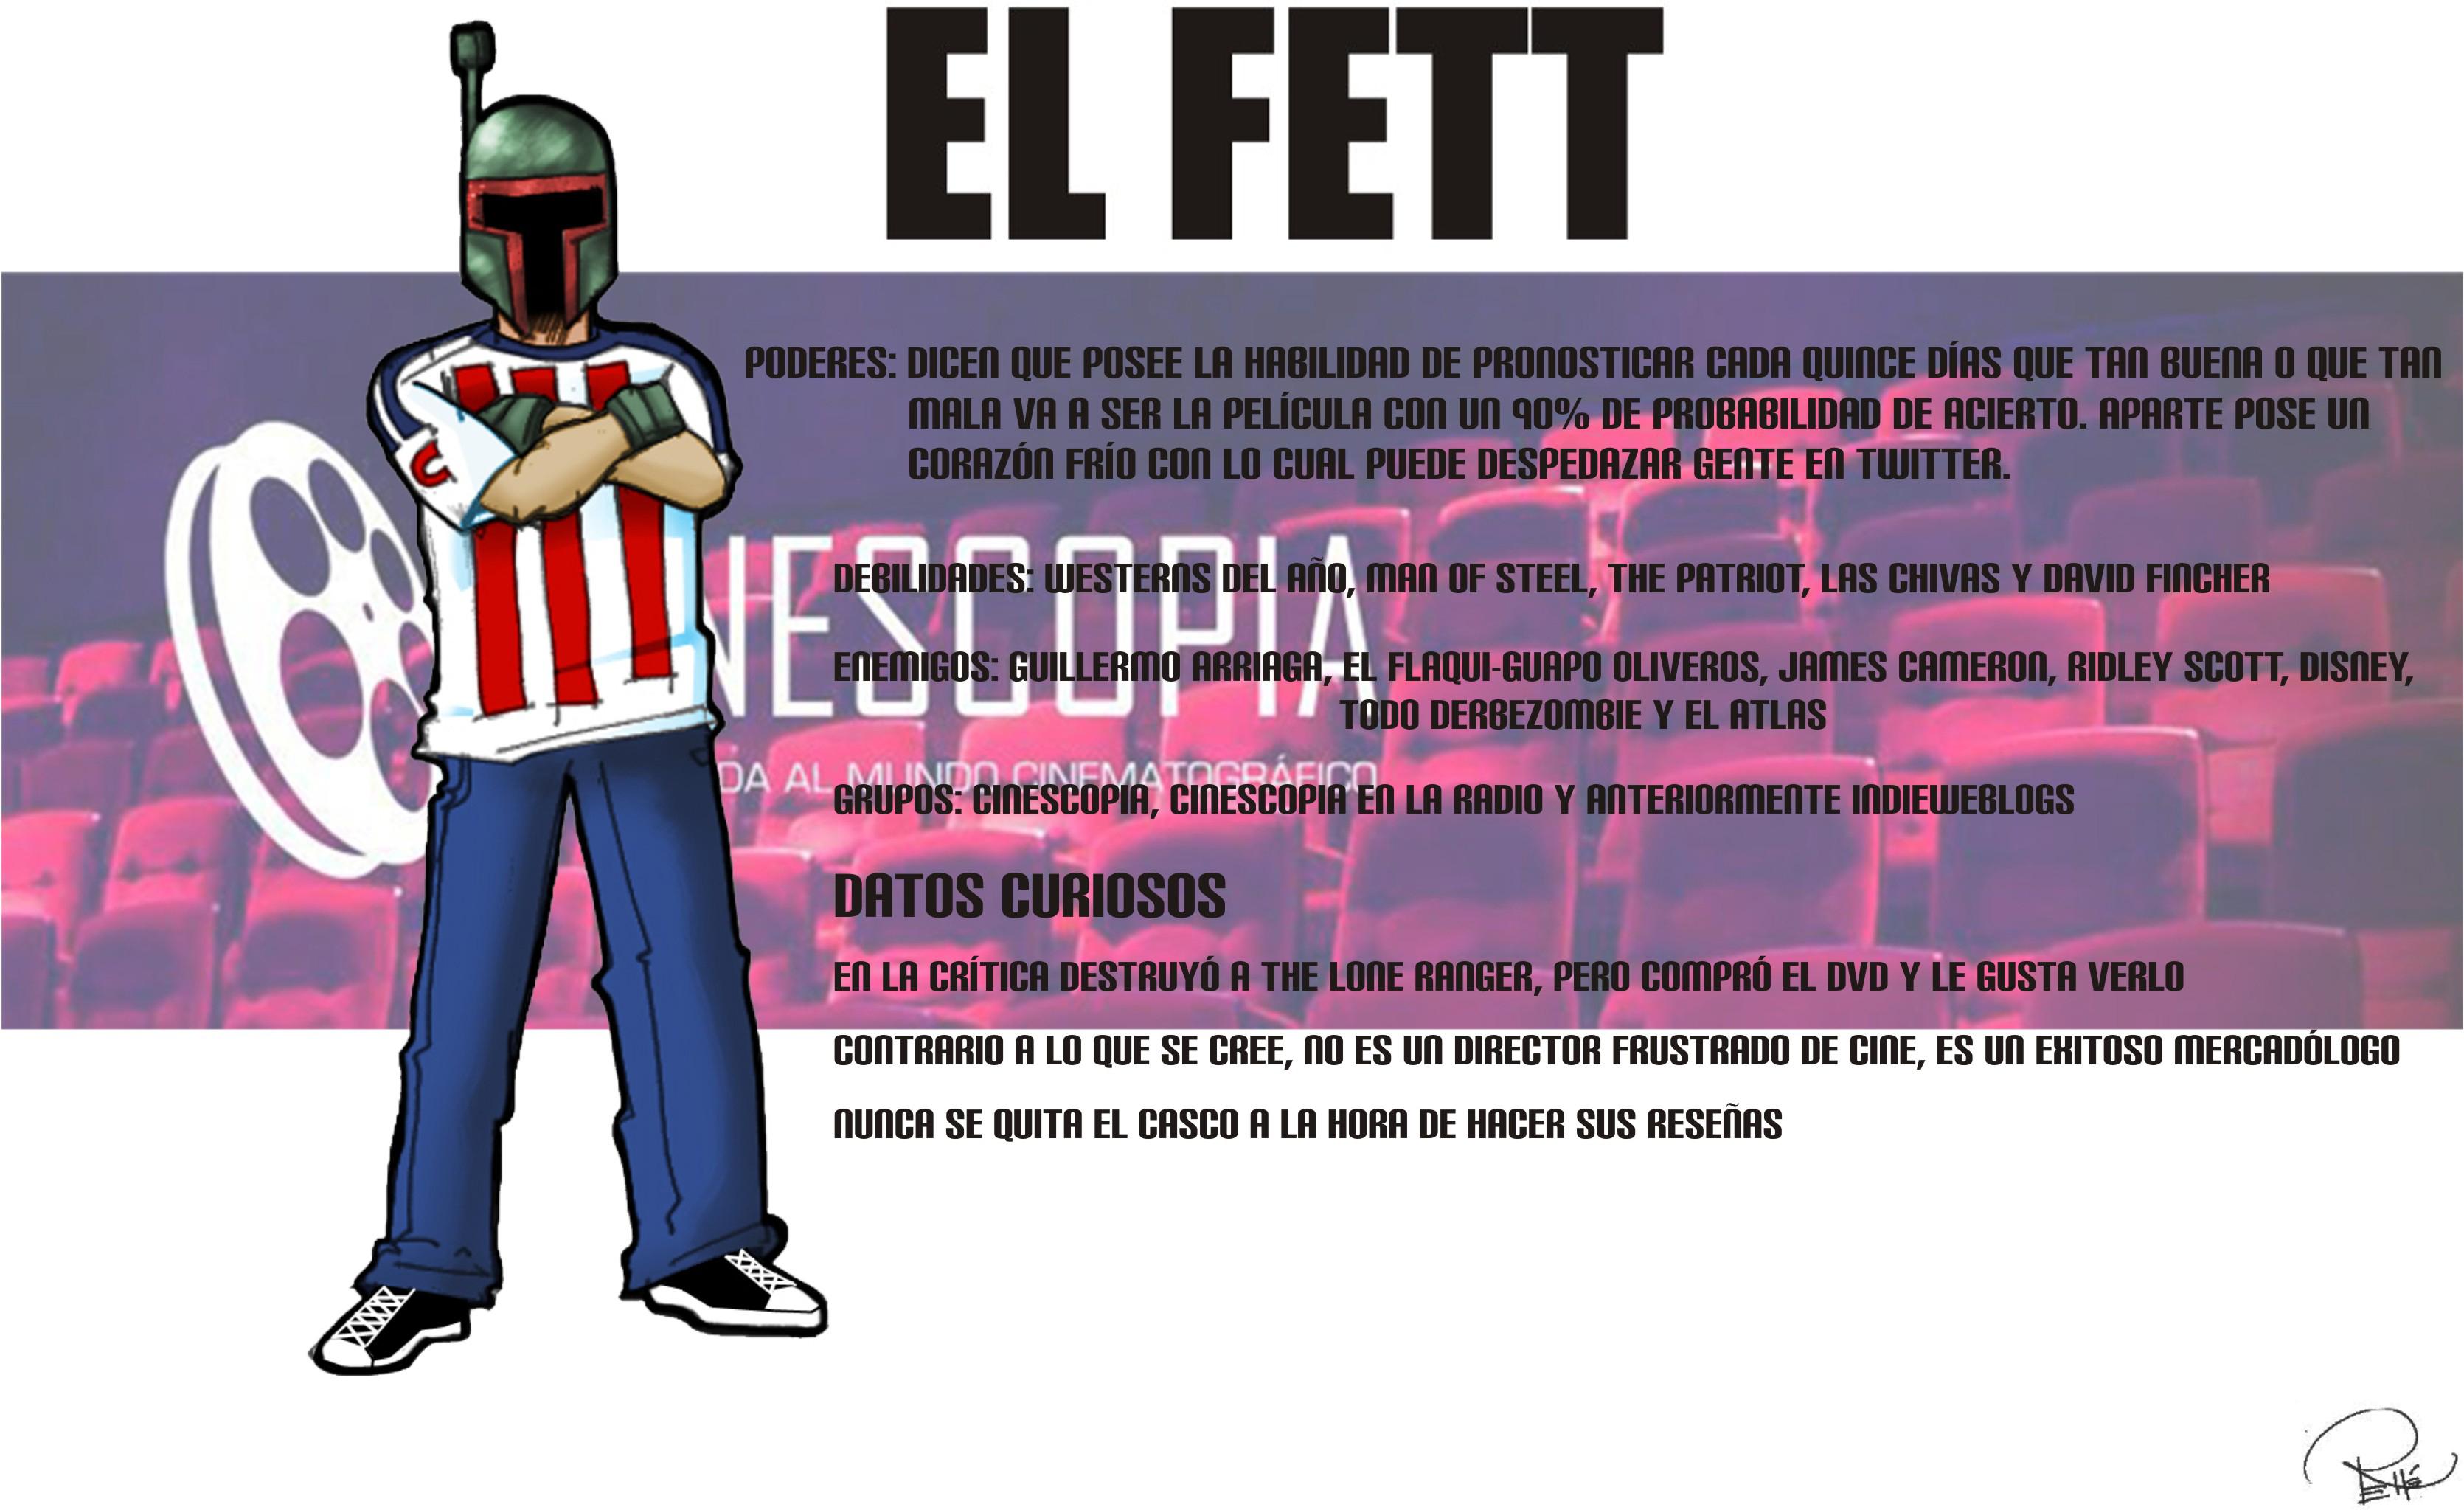 Ficha completa Fett